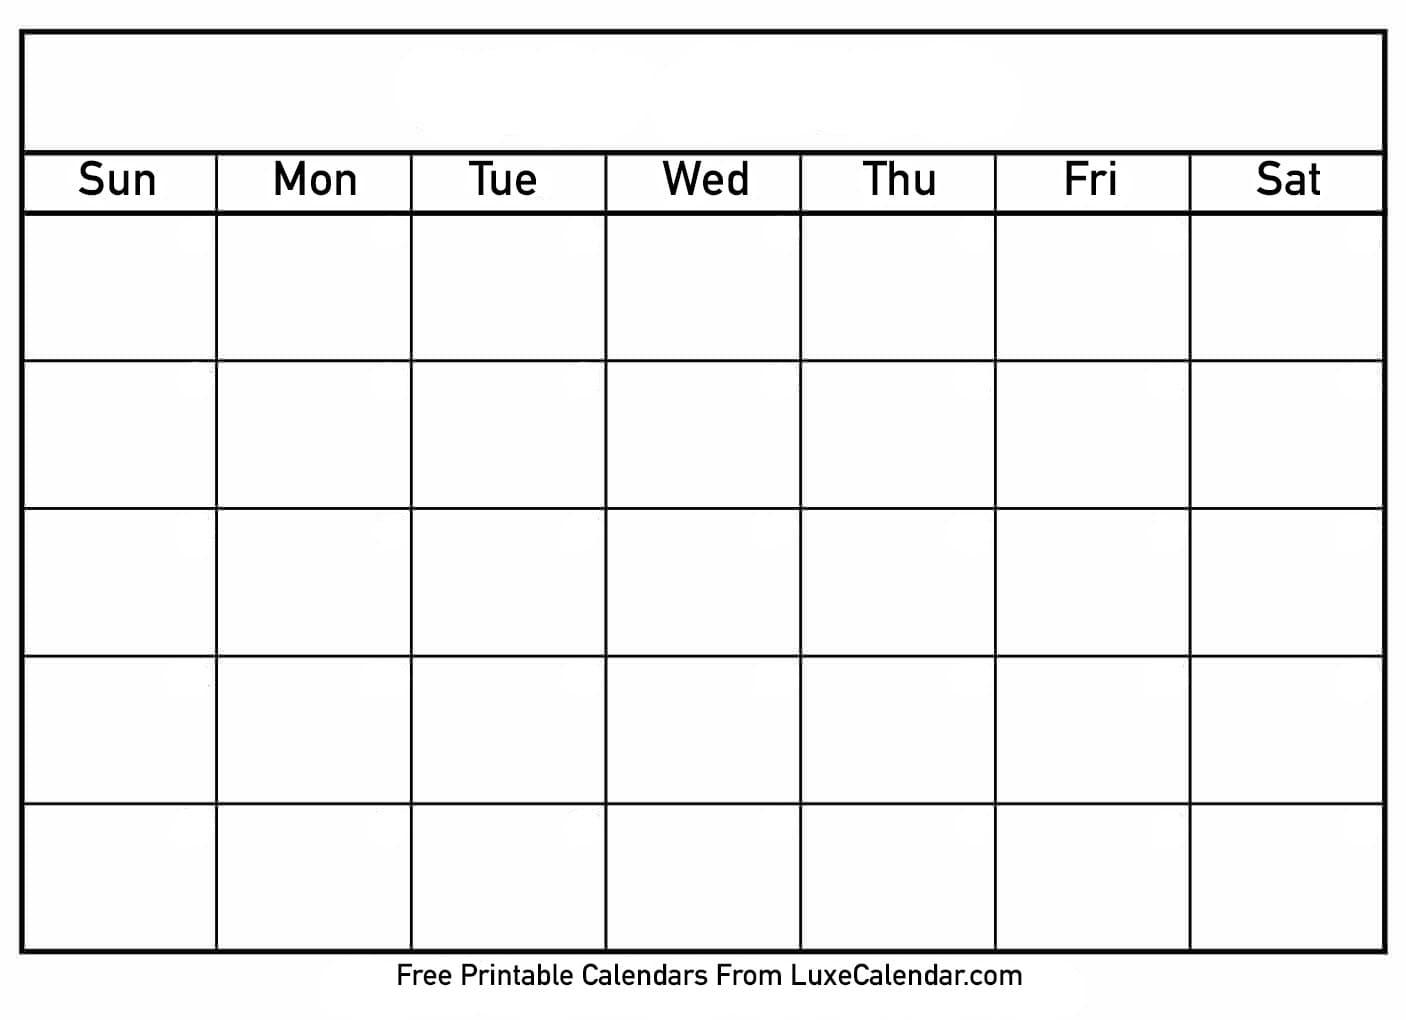 Blank Printable Calendar - Luxe Calendar in Blank Printable Calendar Free